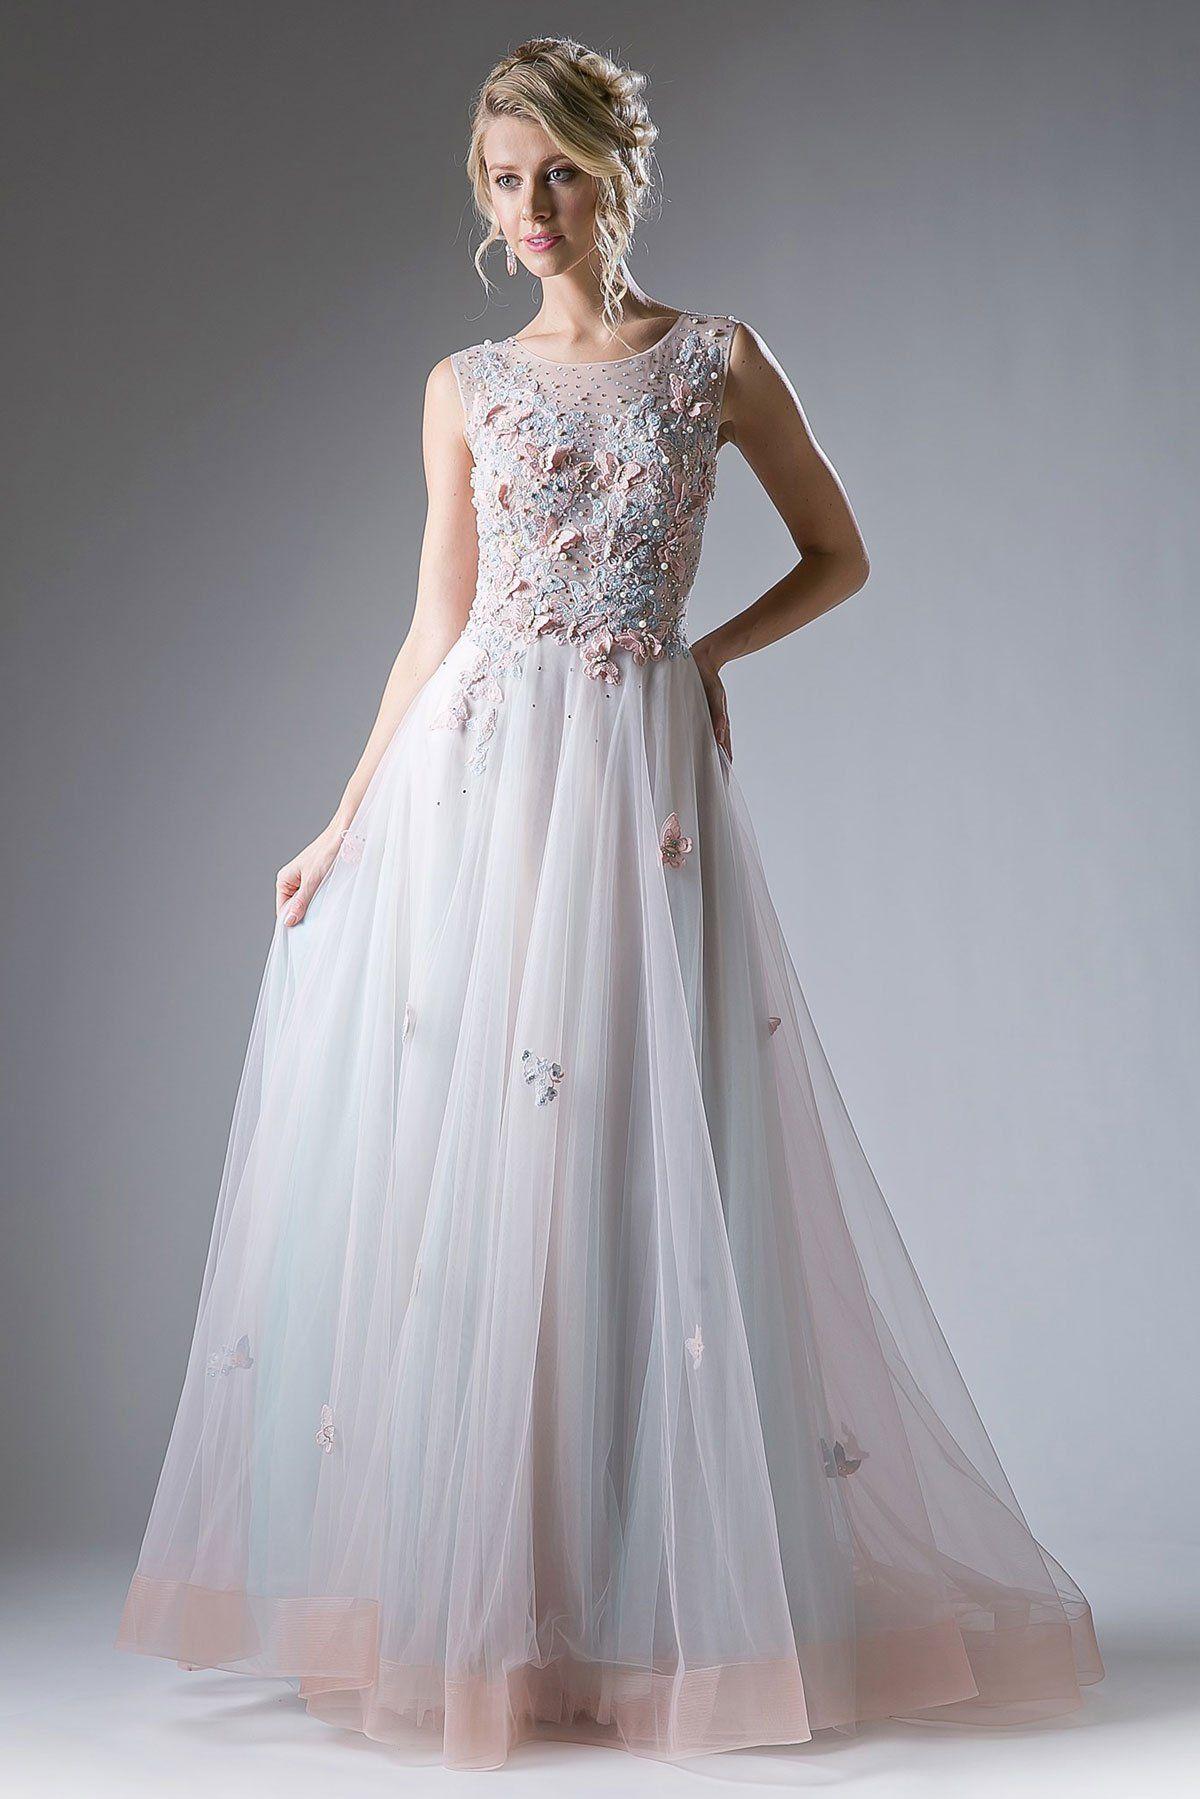 Elegant prom gowns cd dress váy đẹp pinterest prom